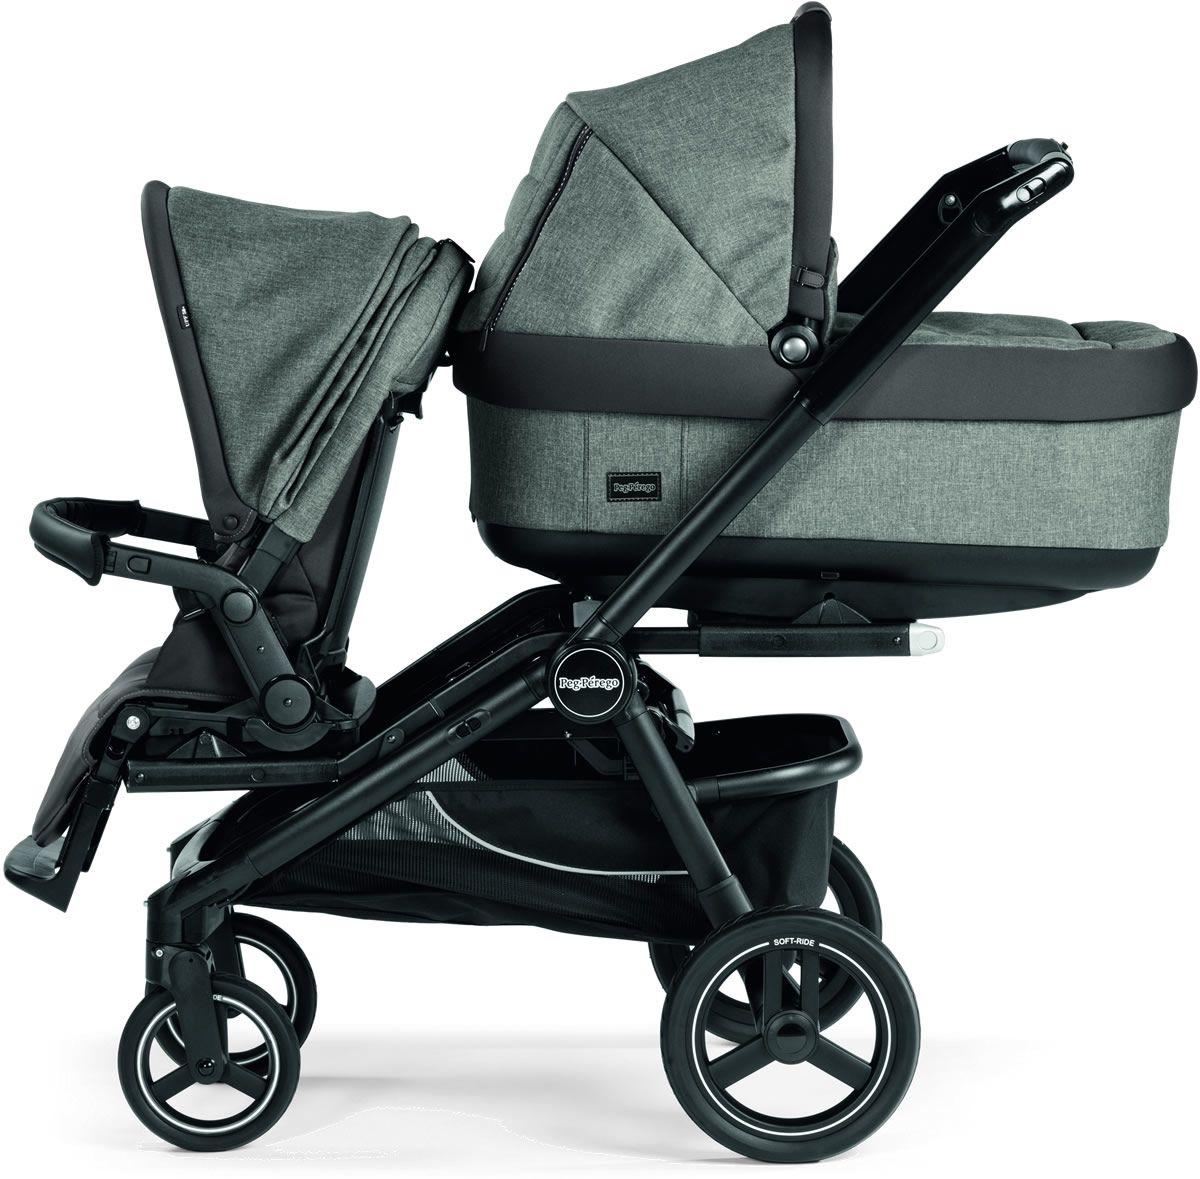 43++ Britax stroller adapter for peg perego info